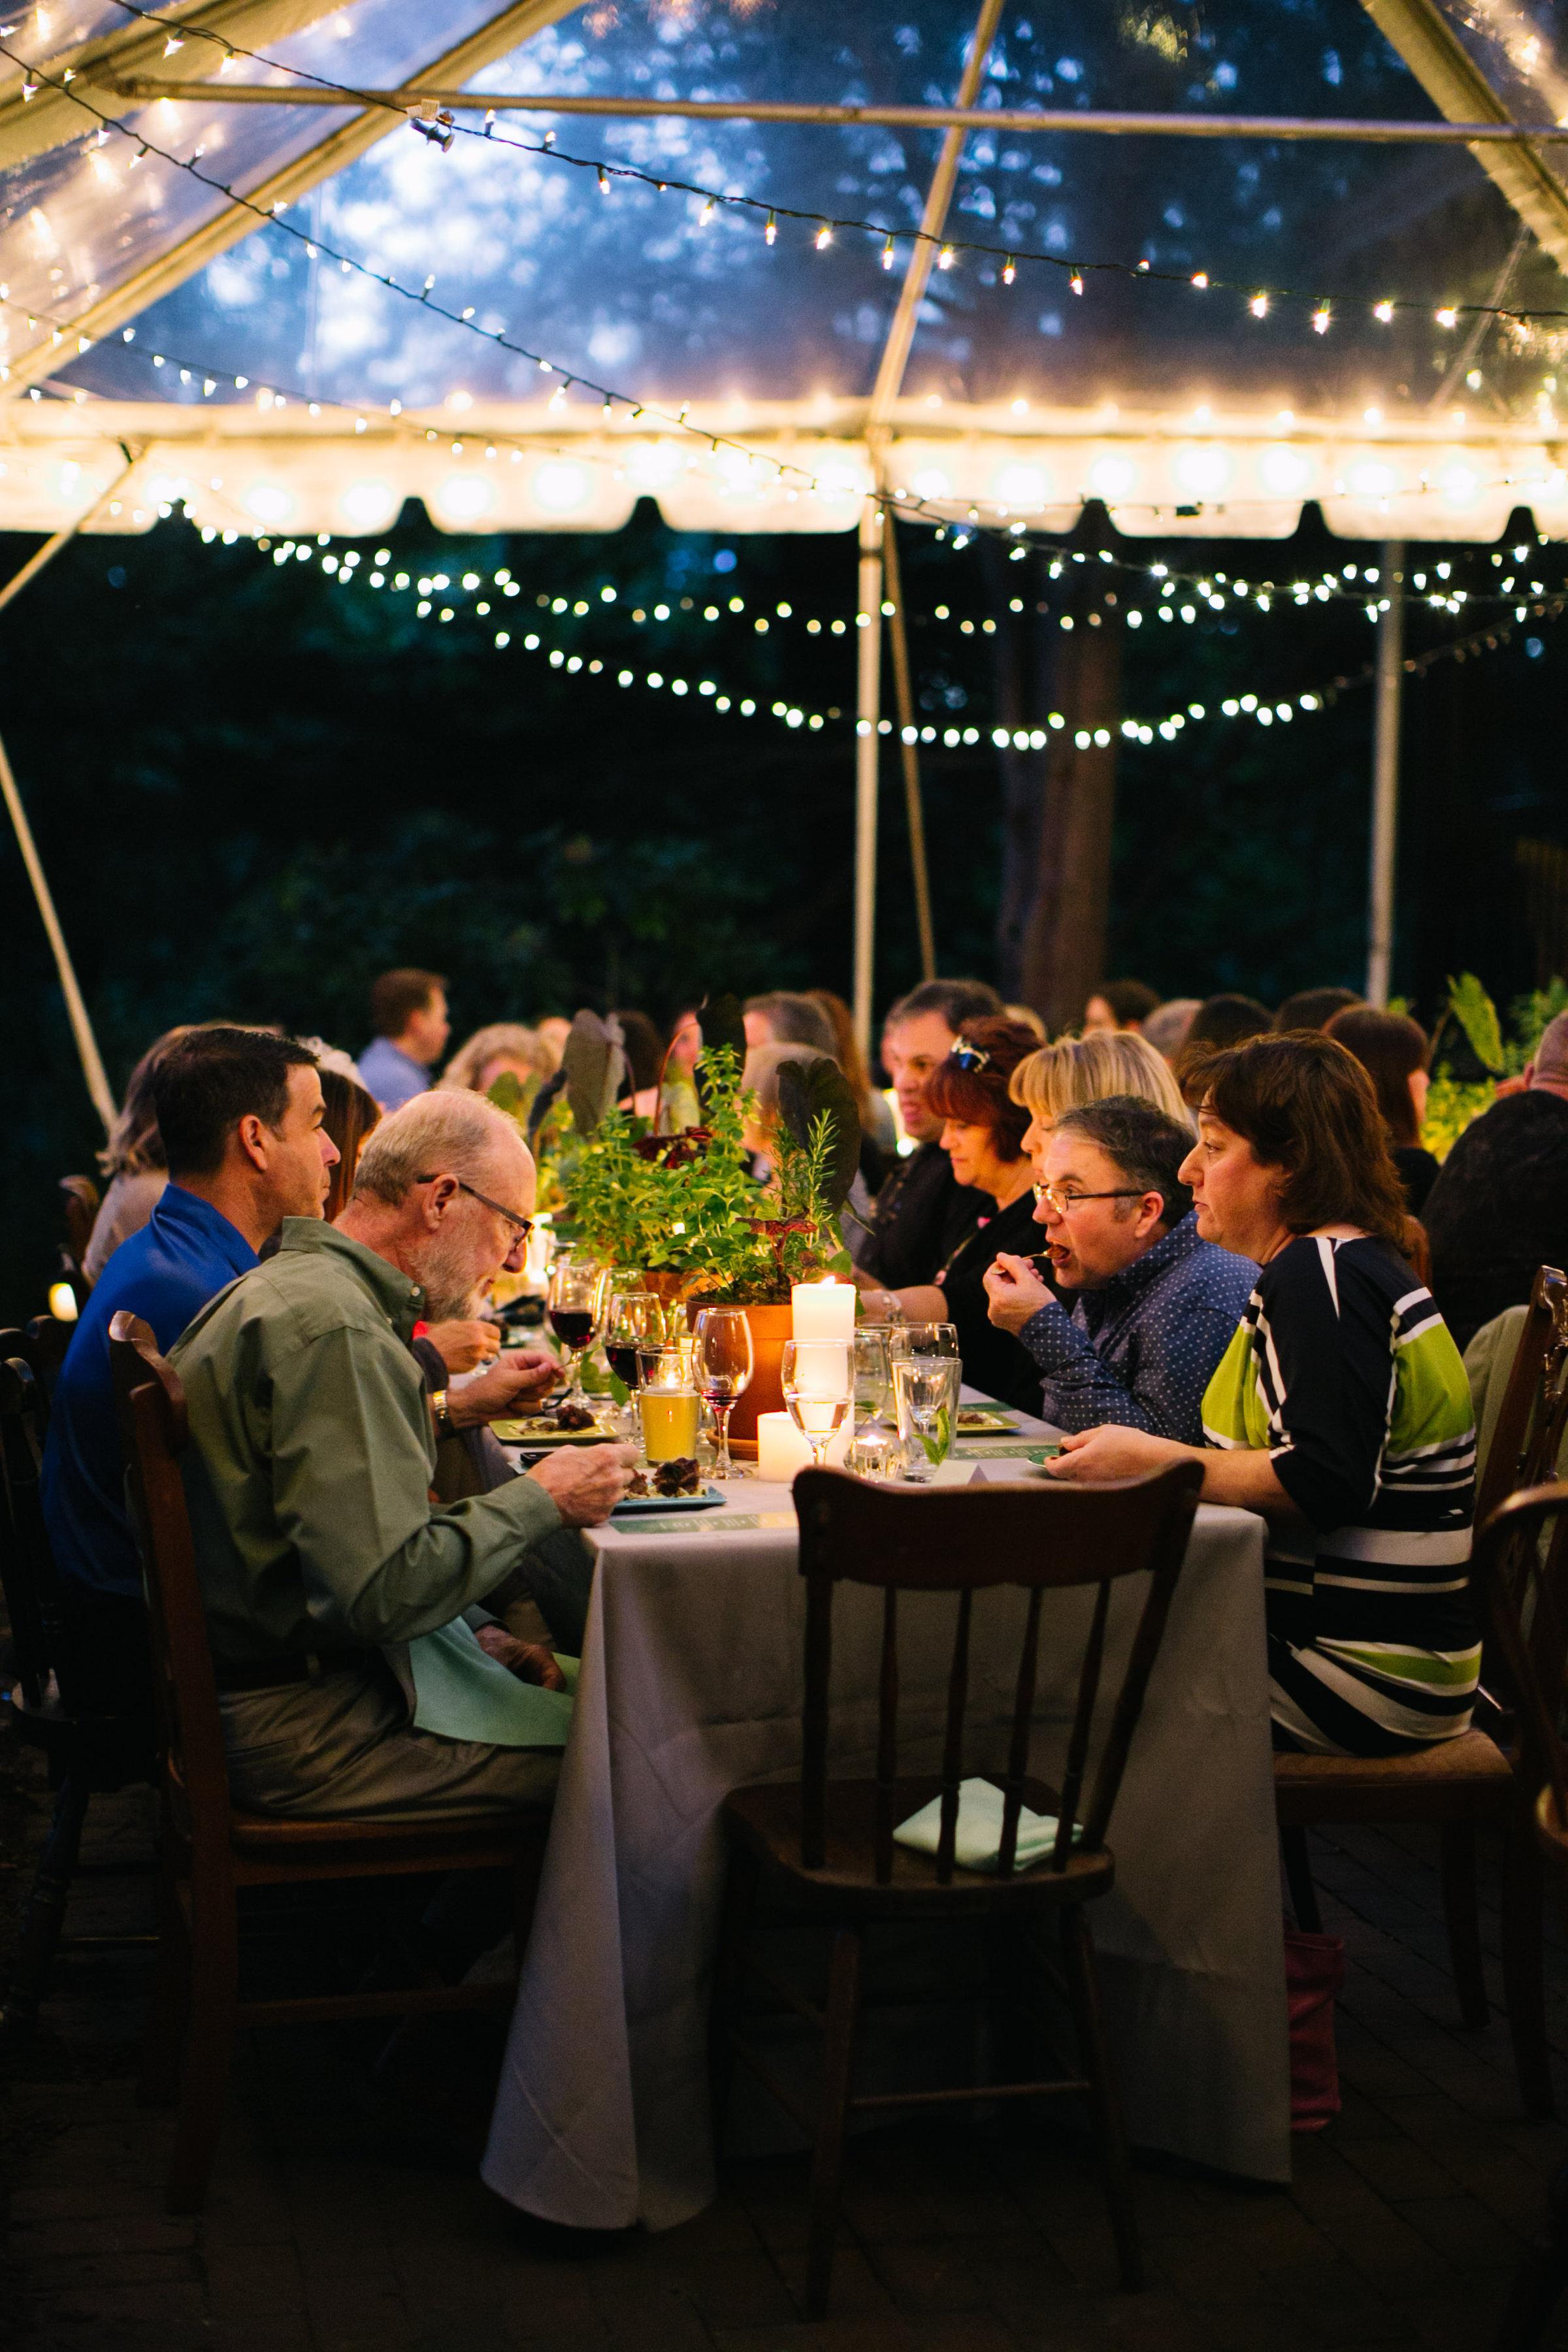 West-Chester-PA-Faunbrook-Harvest-Dinner-Series-Mint-BrittneyRaine-186.JPG